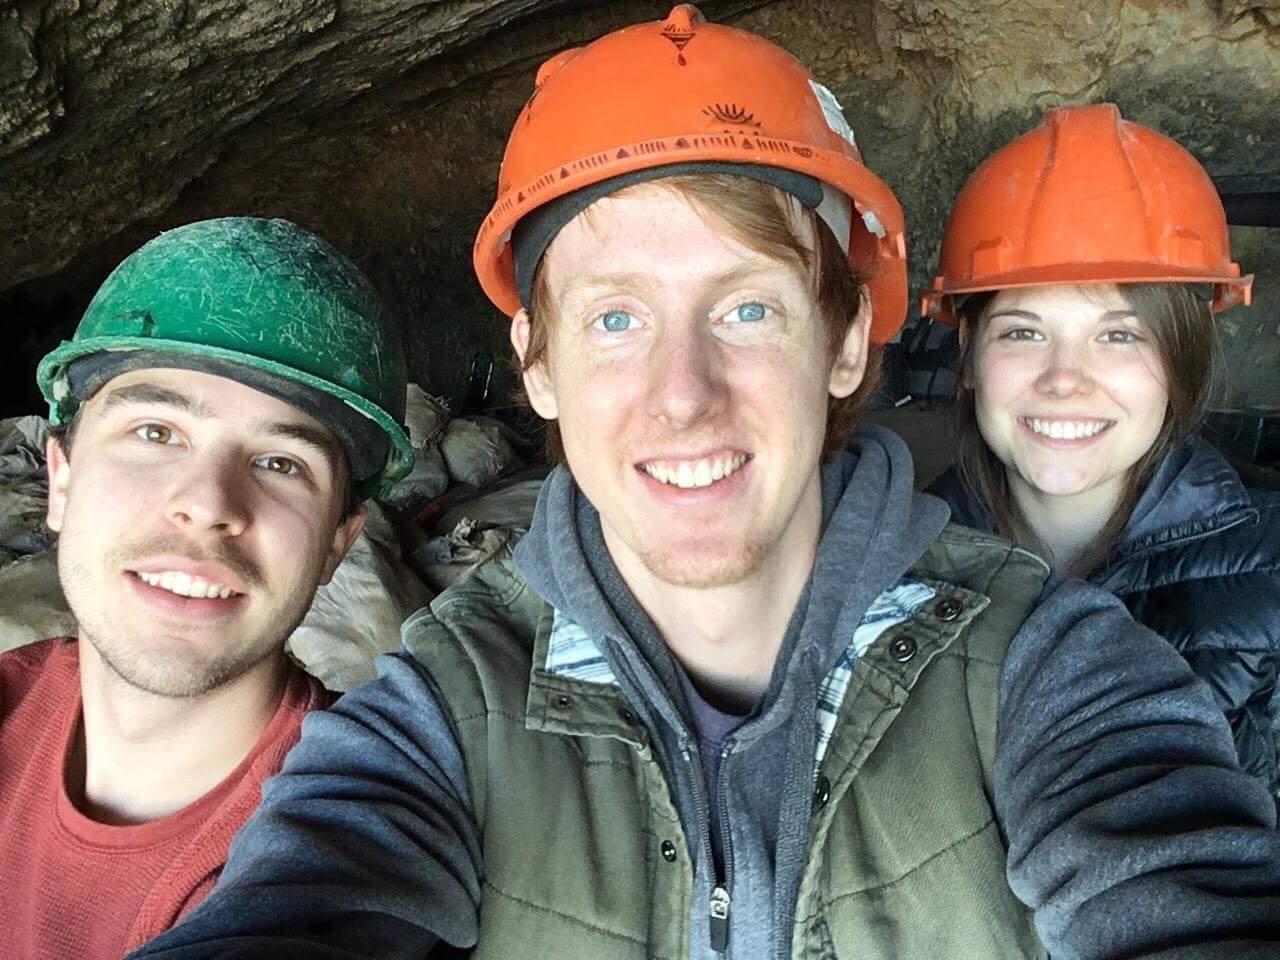 A photo of three people wearing orange hats .